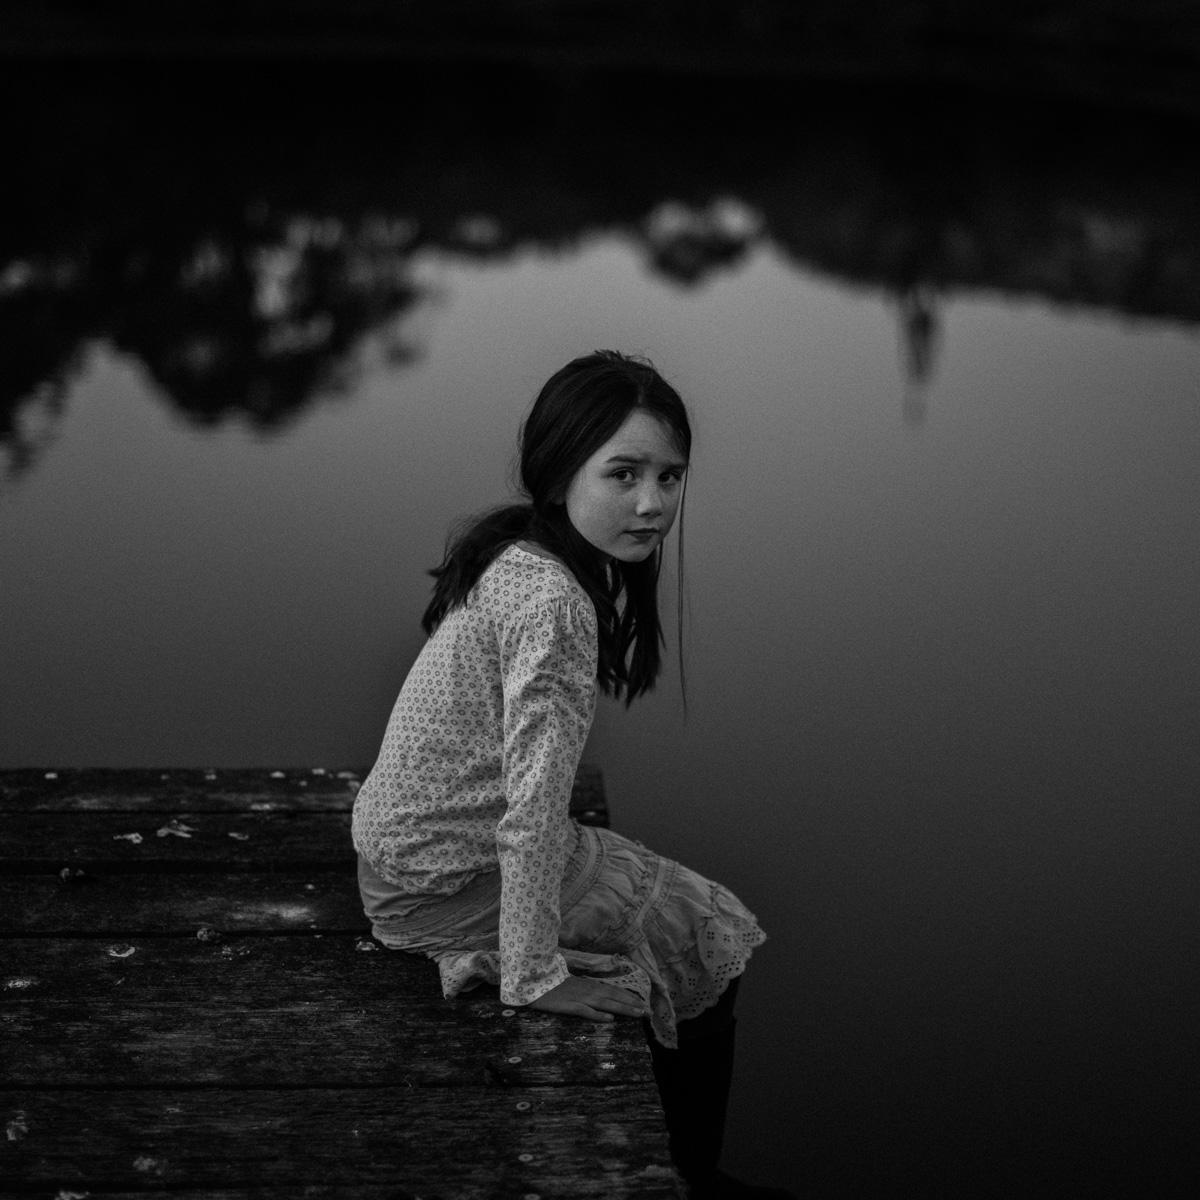 portraits-125.jpg